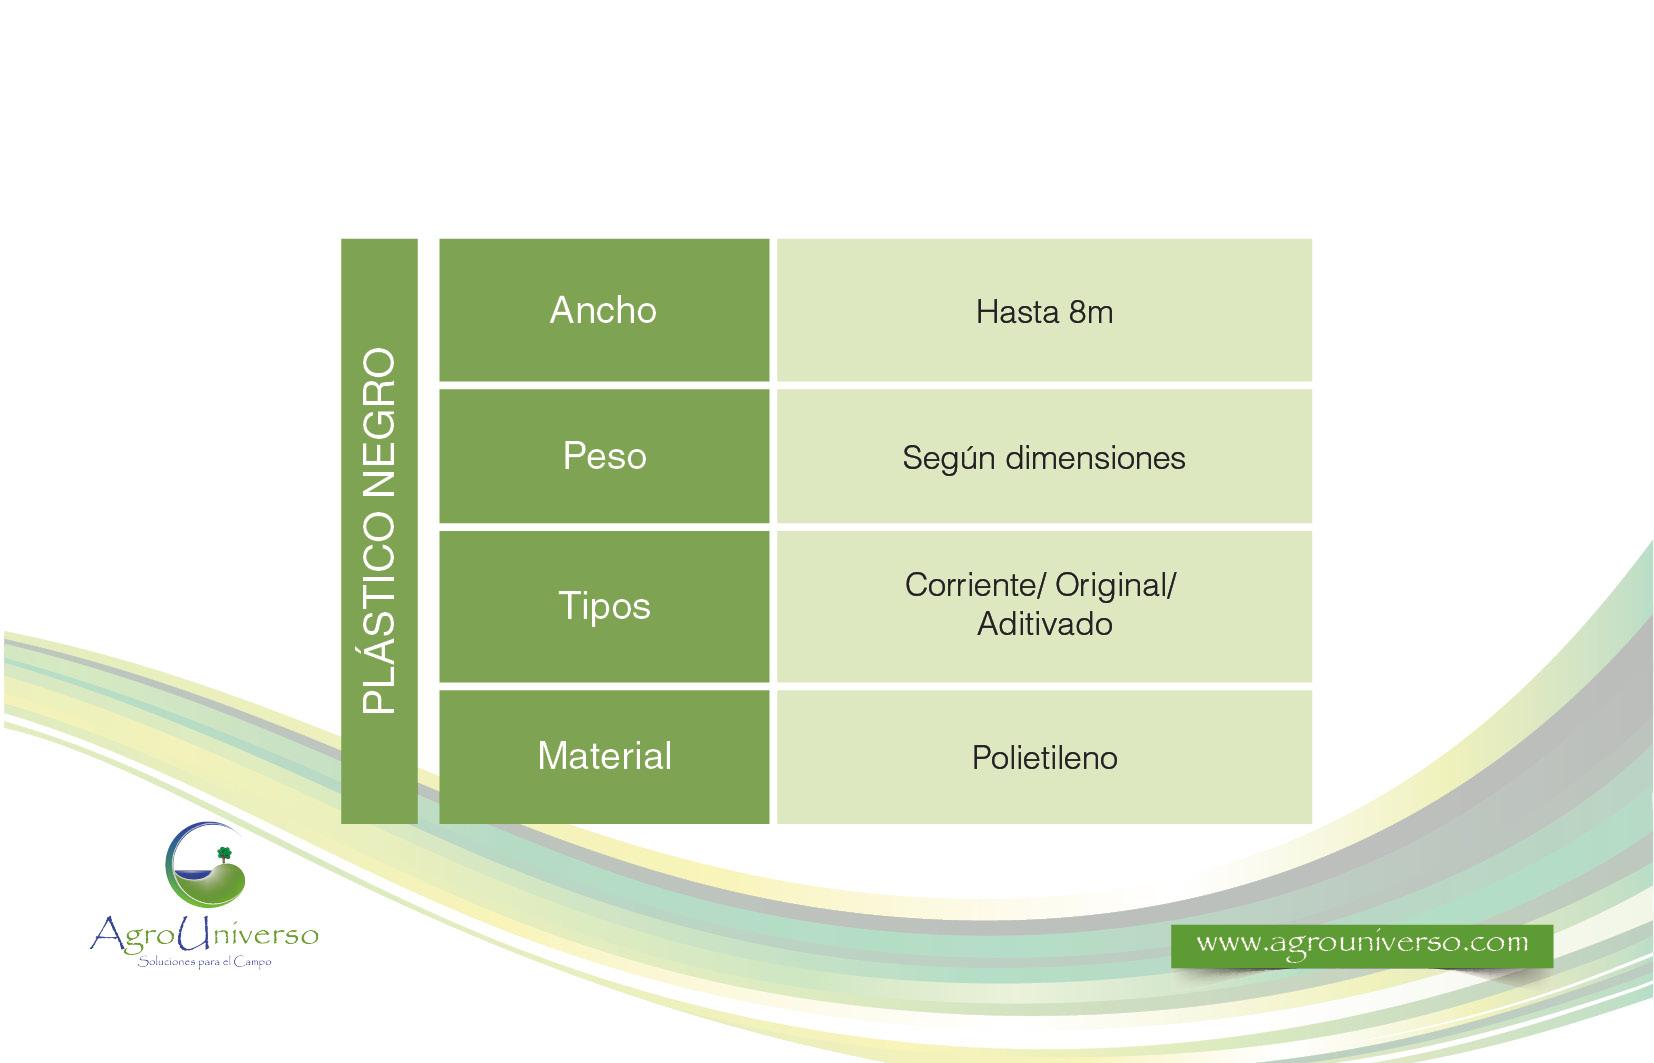 Catlogo-de-productos-Agrouniverso-17